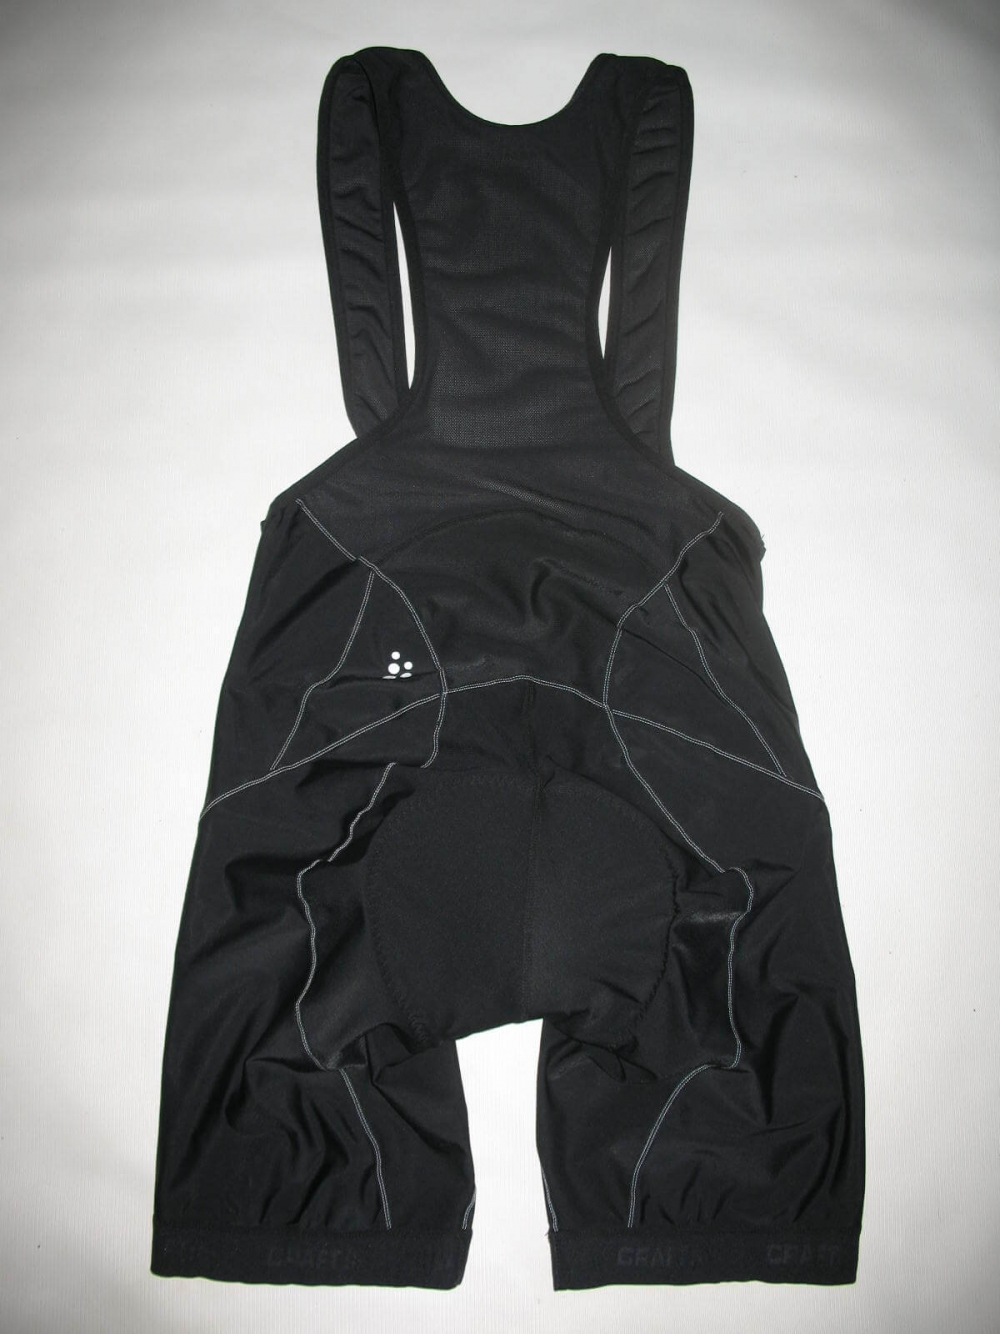 Велошорты CRAFT cycling bib shorts (размер L) - 2